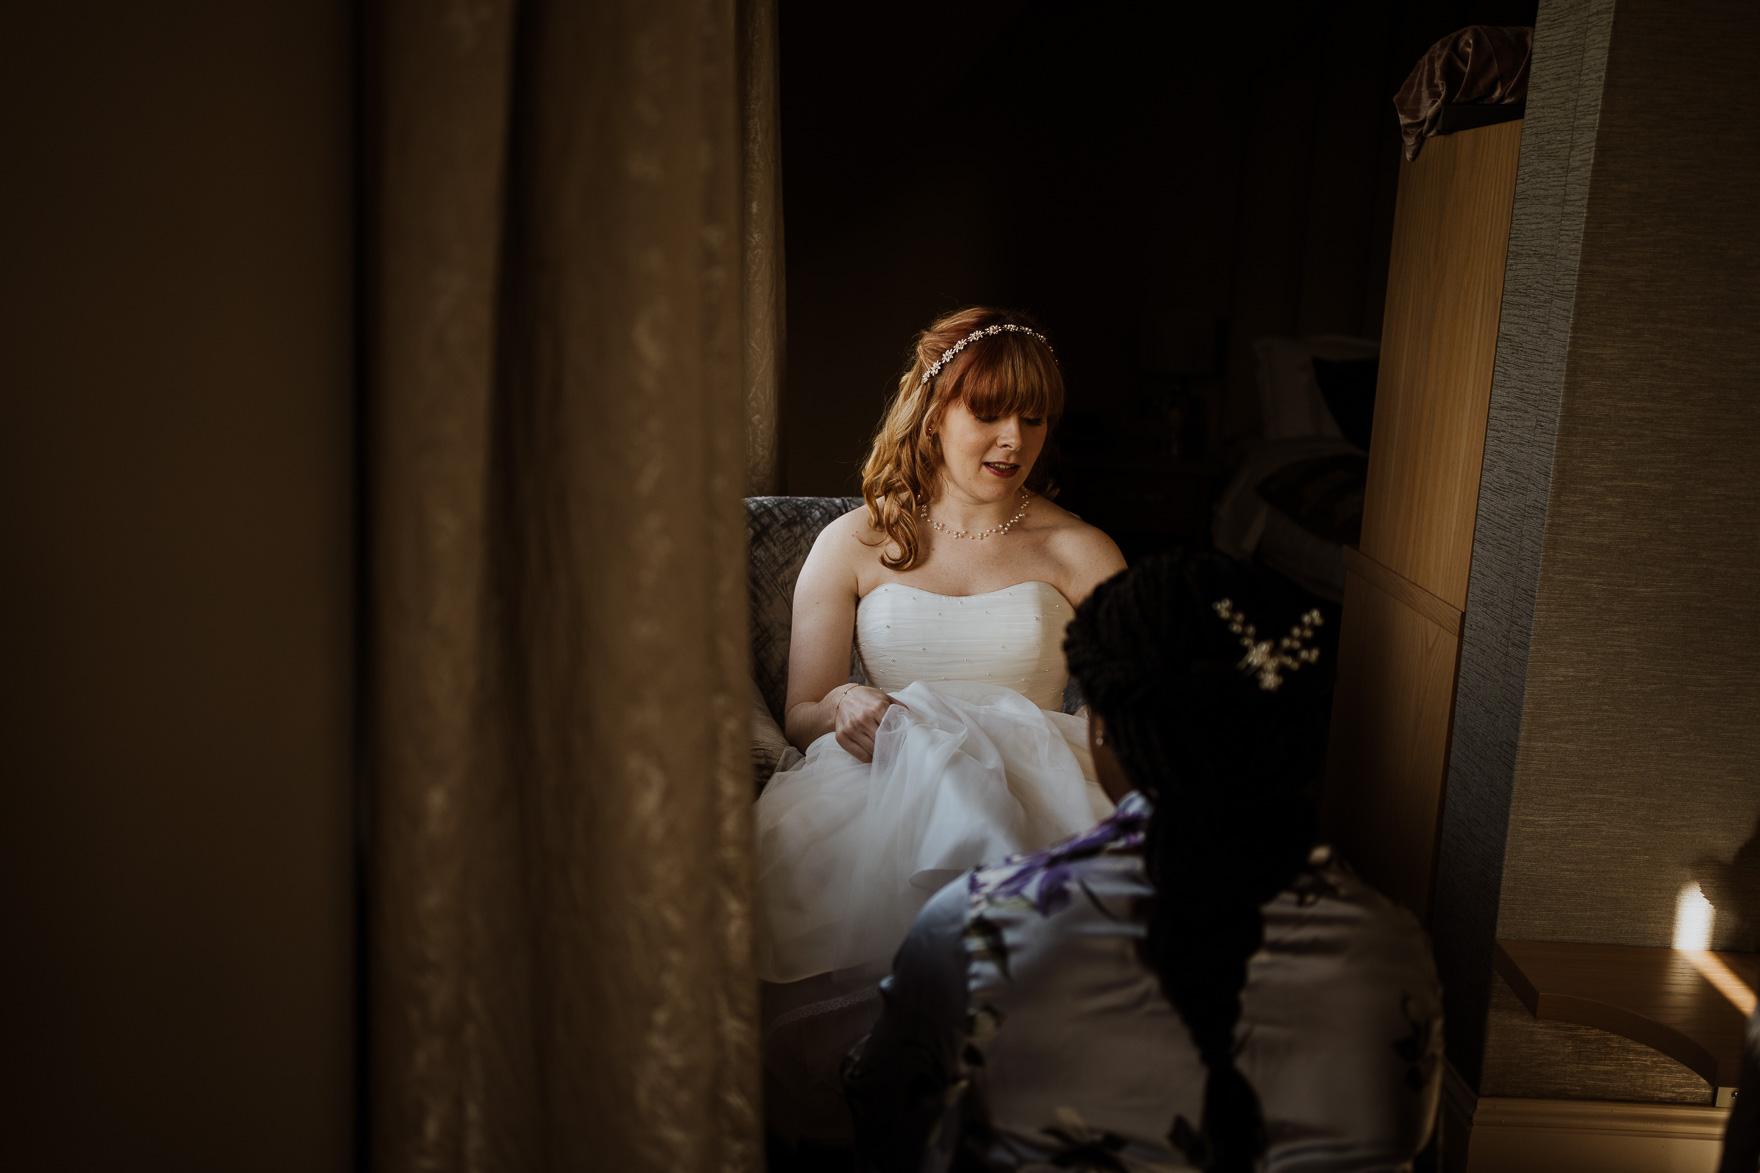 Rachel Steele sitting on a suitcase